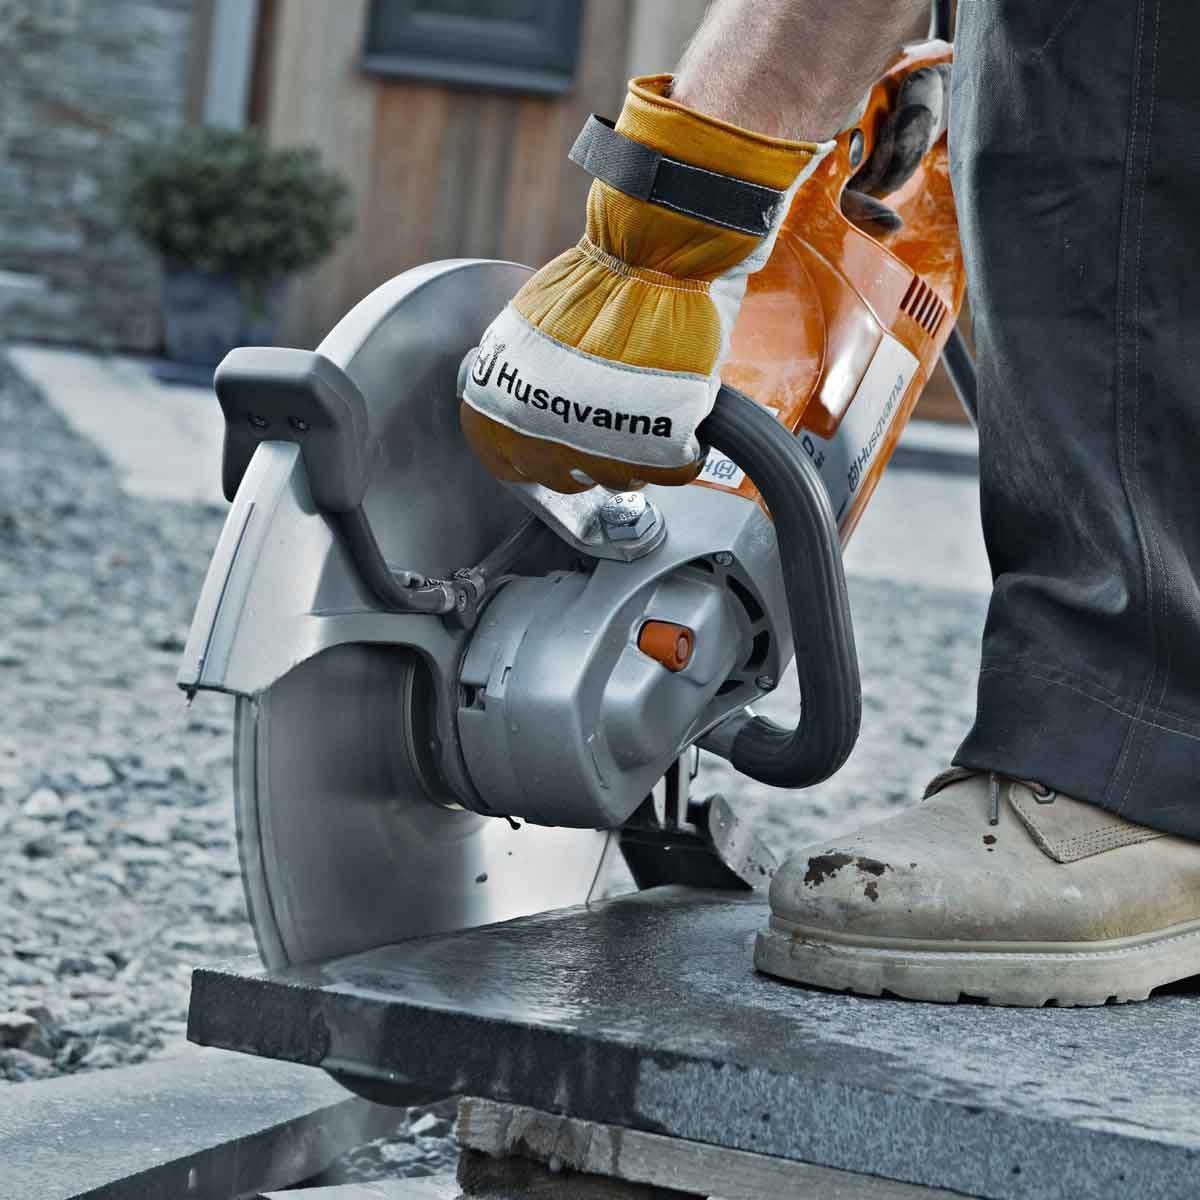 Husqvarna K3000 Wet Concrete Saw Contractors Direct